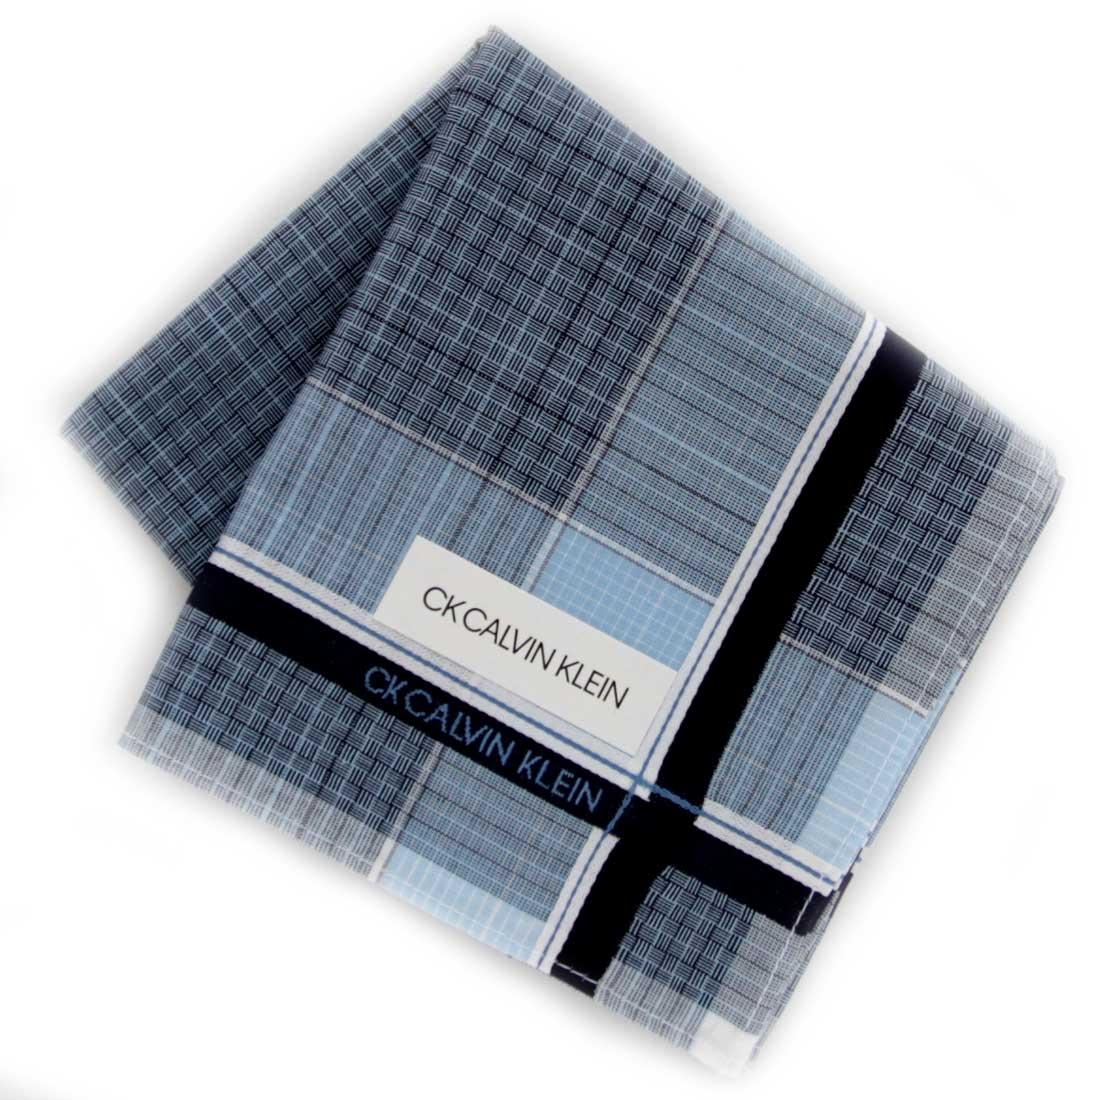 Calvin Klein カルバン クライン ブルー 超美品再入荷品質至上 メンズハンカチ 0253 再入荷/予約販売!